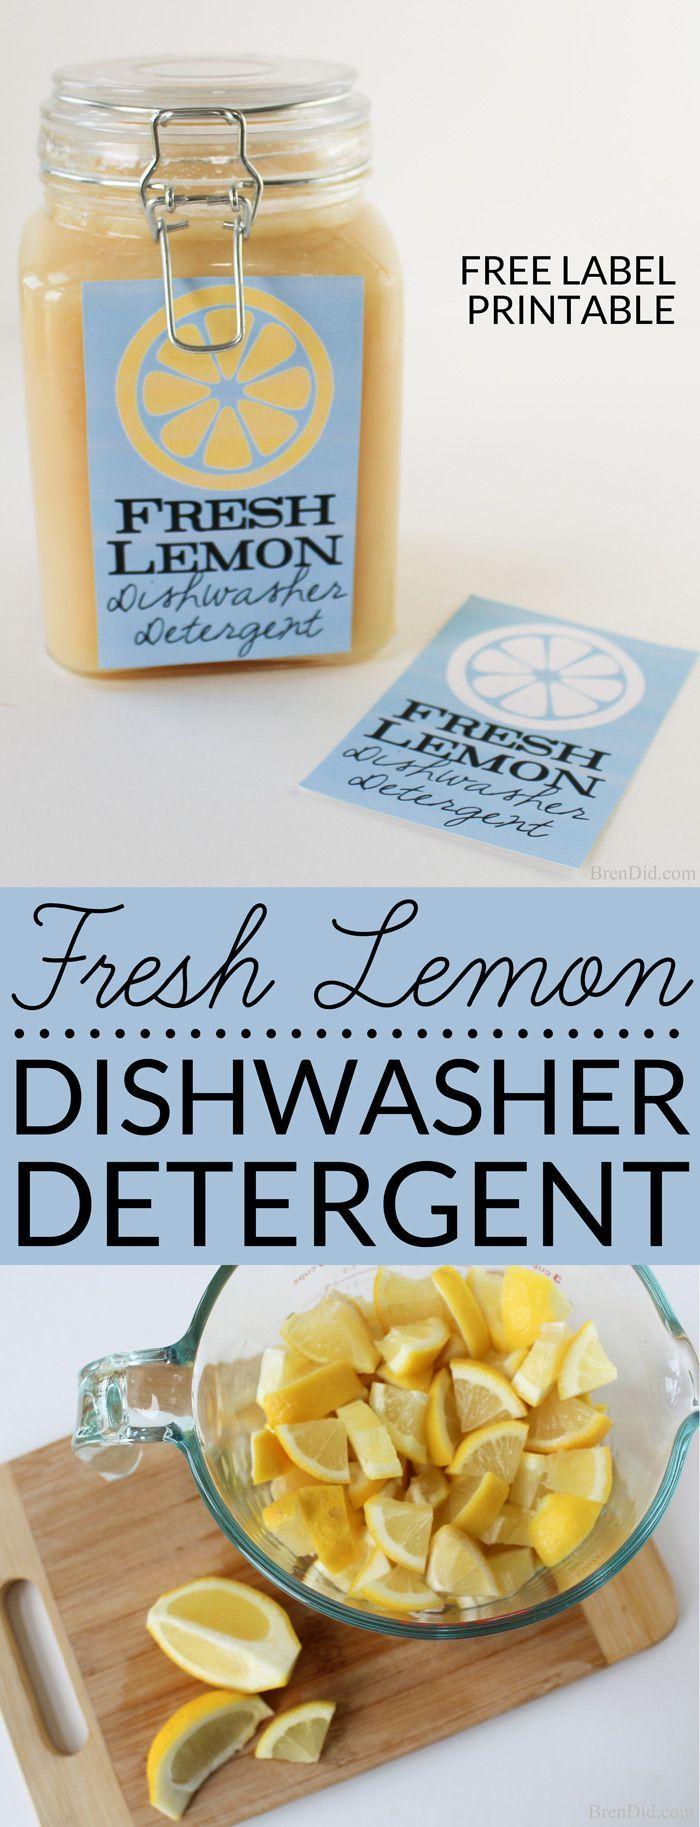 Fresh Lemon Homemade Dishwasher Detergent uses real lemons, salt & vinegar to make liquid dishwasher detergent. Learn about the recipe & its effectiveness.